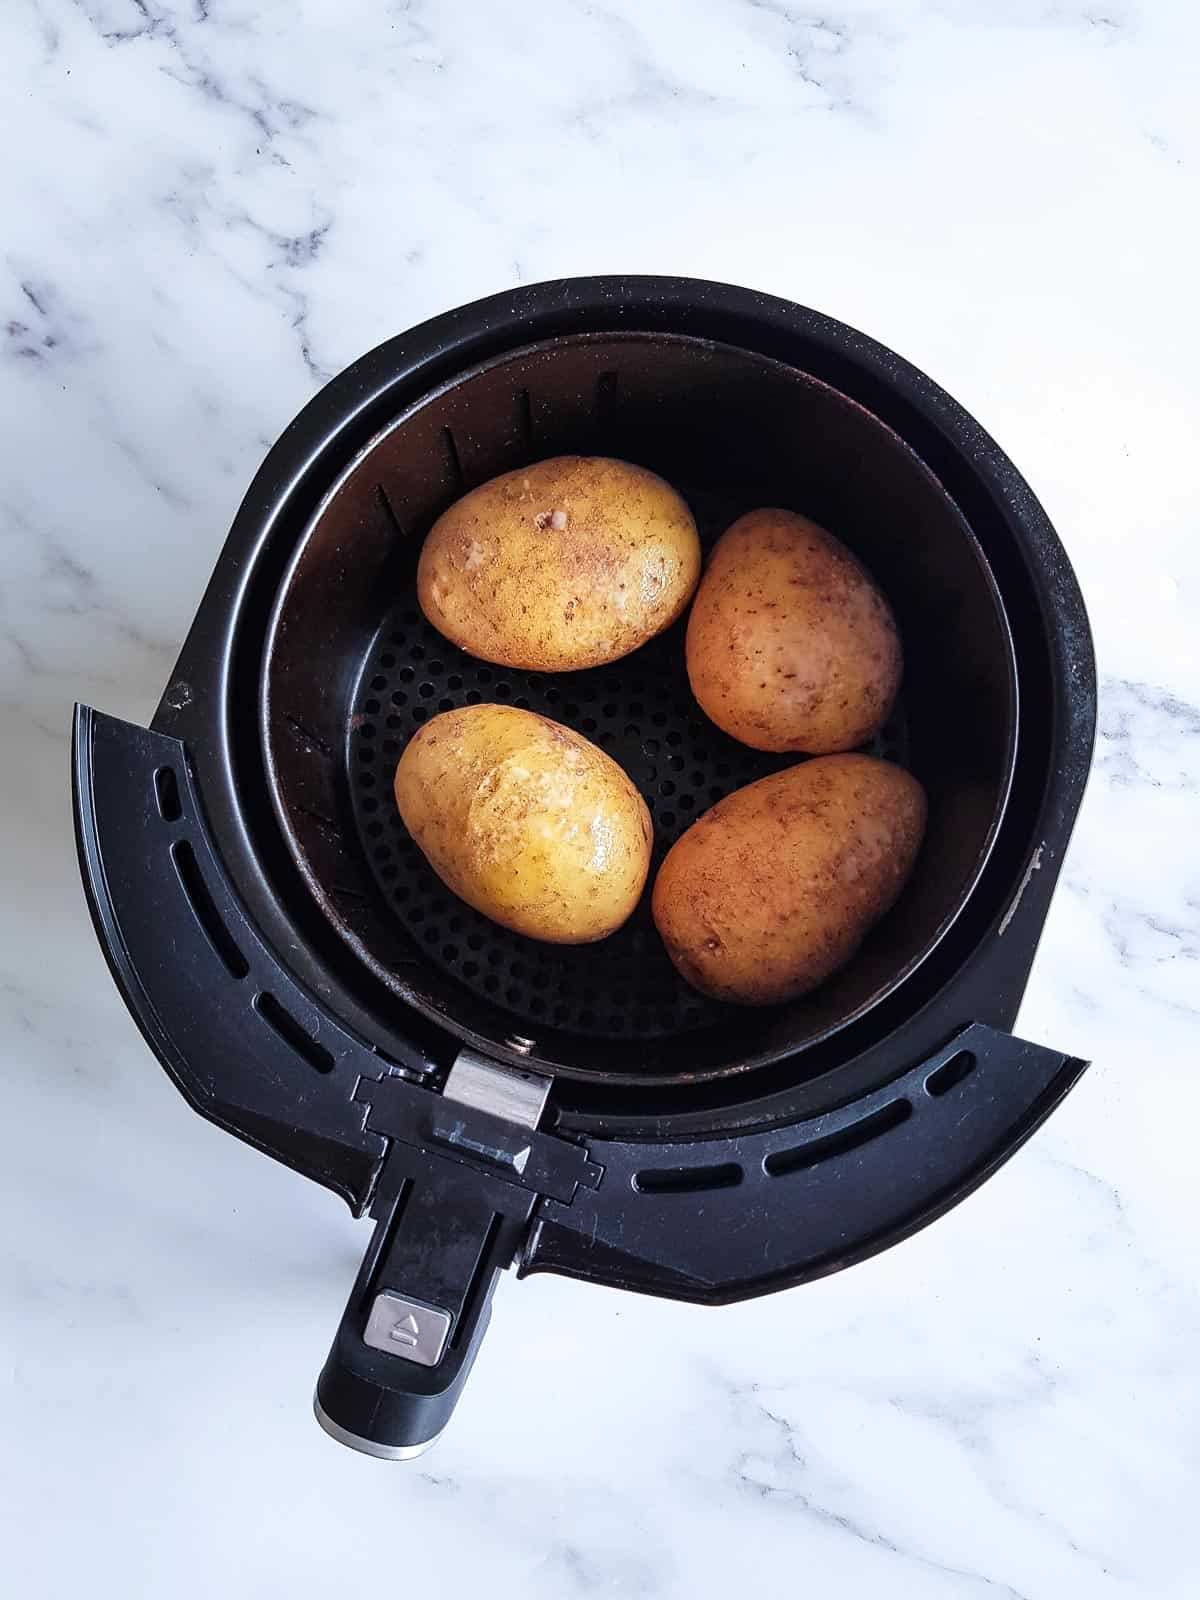 Raw potatoes in an air fryer.